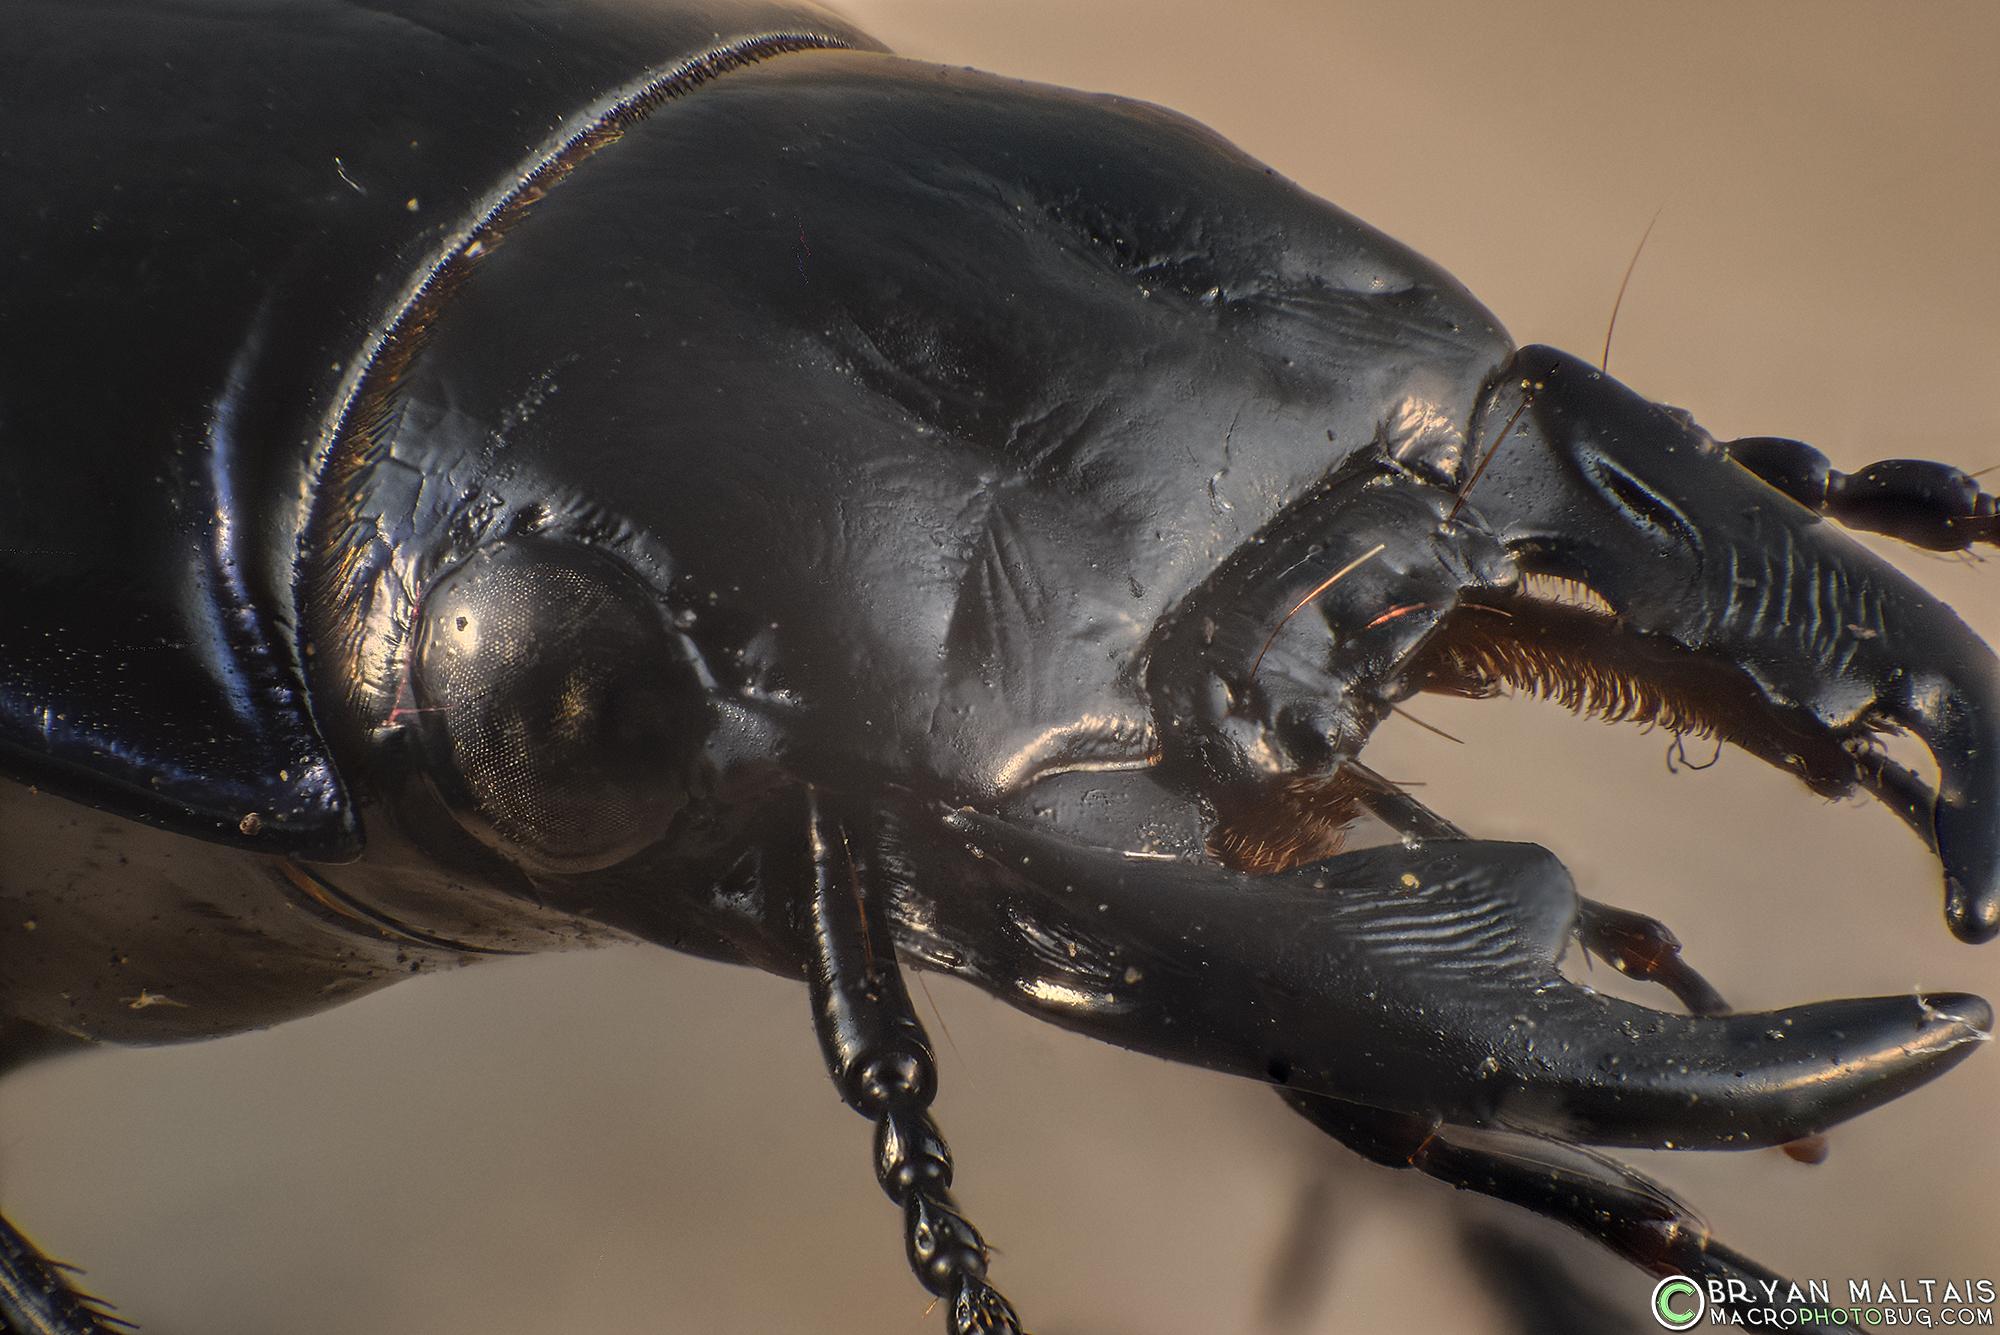 ground beetle head 18-55 at 18